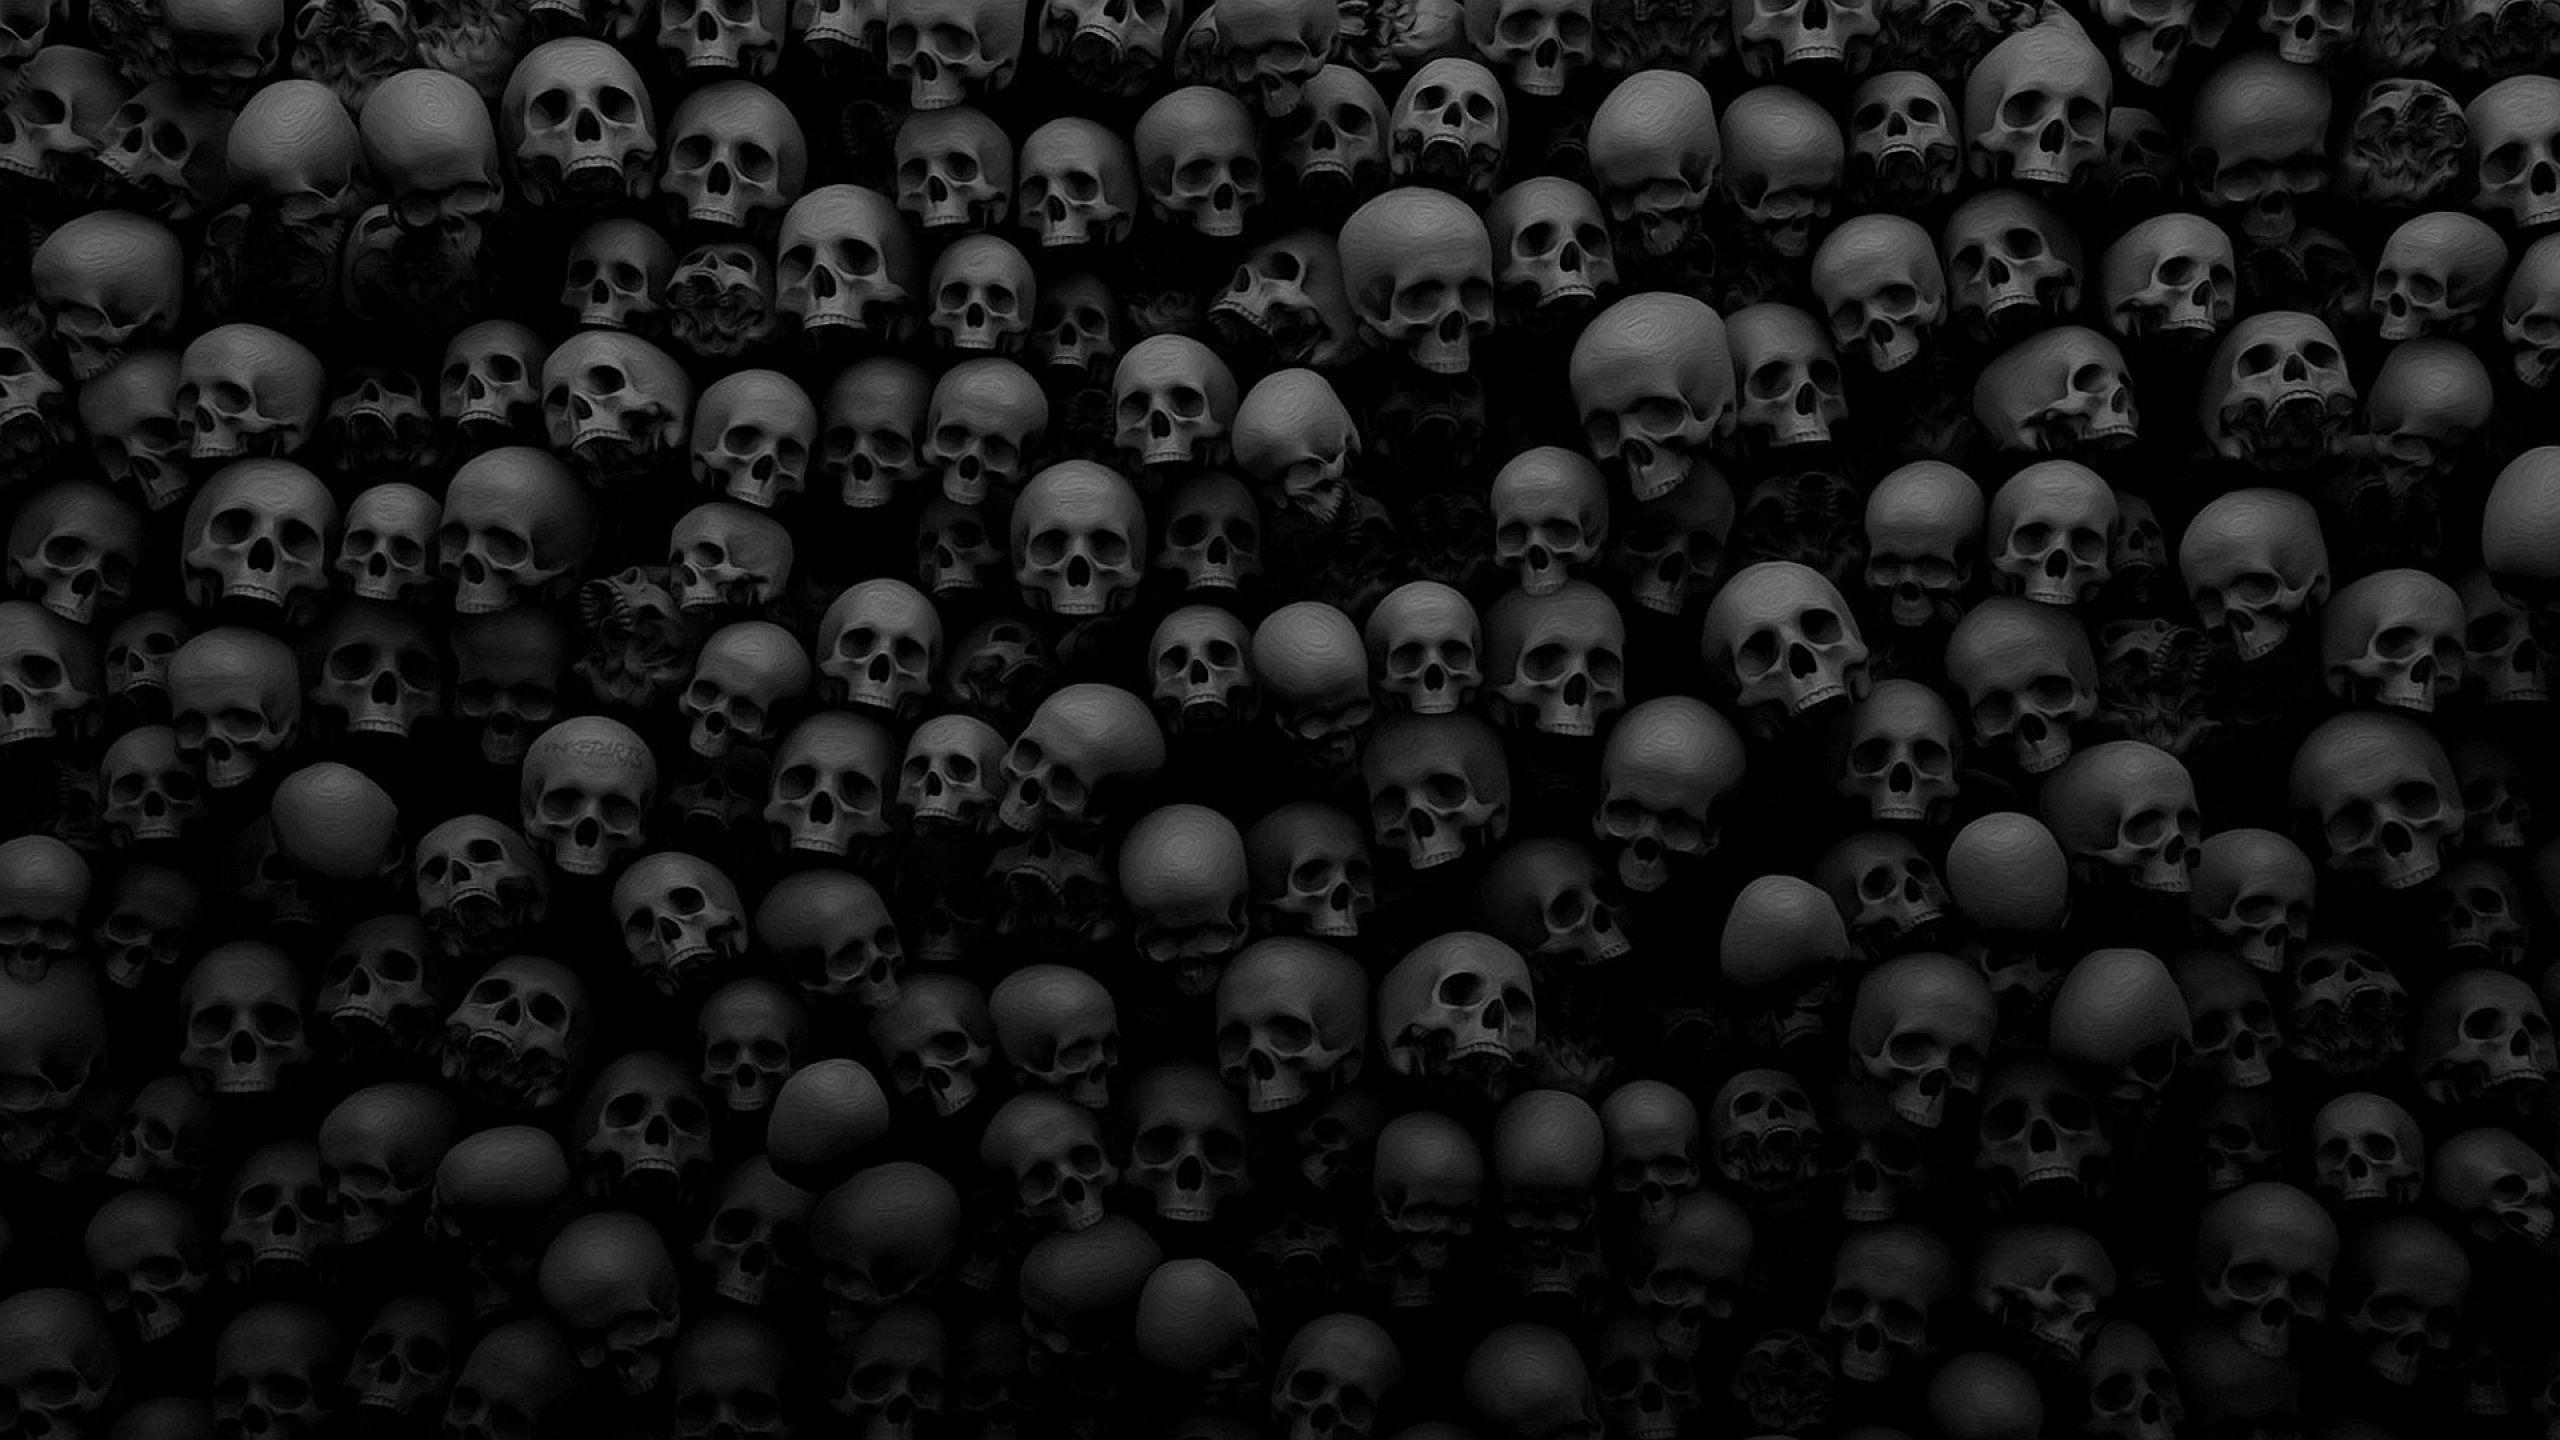 Dark Evil Horror Spooky Creepy Scary Wallpaper 2560x1440 Fondo De Pantalla Panoramica Arte Del Horror Fondos De Pantalla Calaveras Dark gothic creepy wallpaper